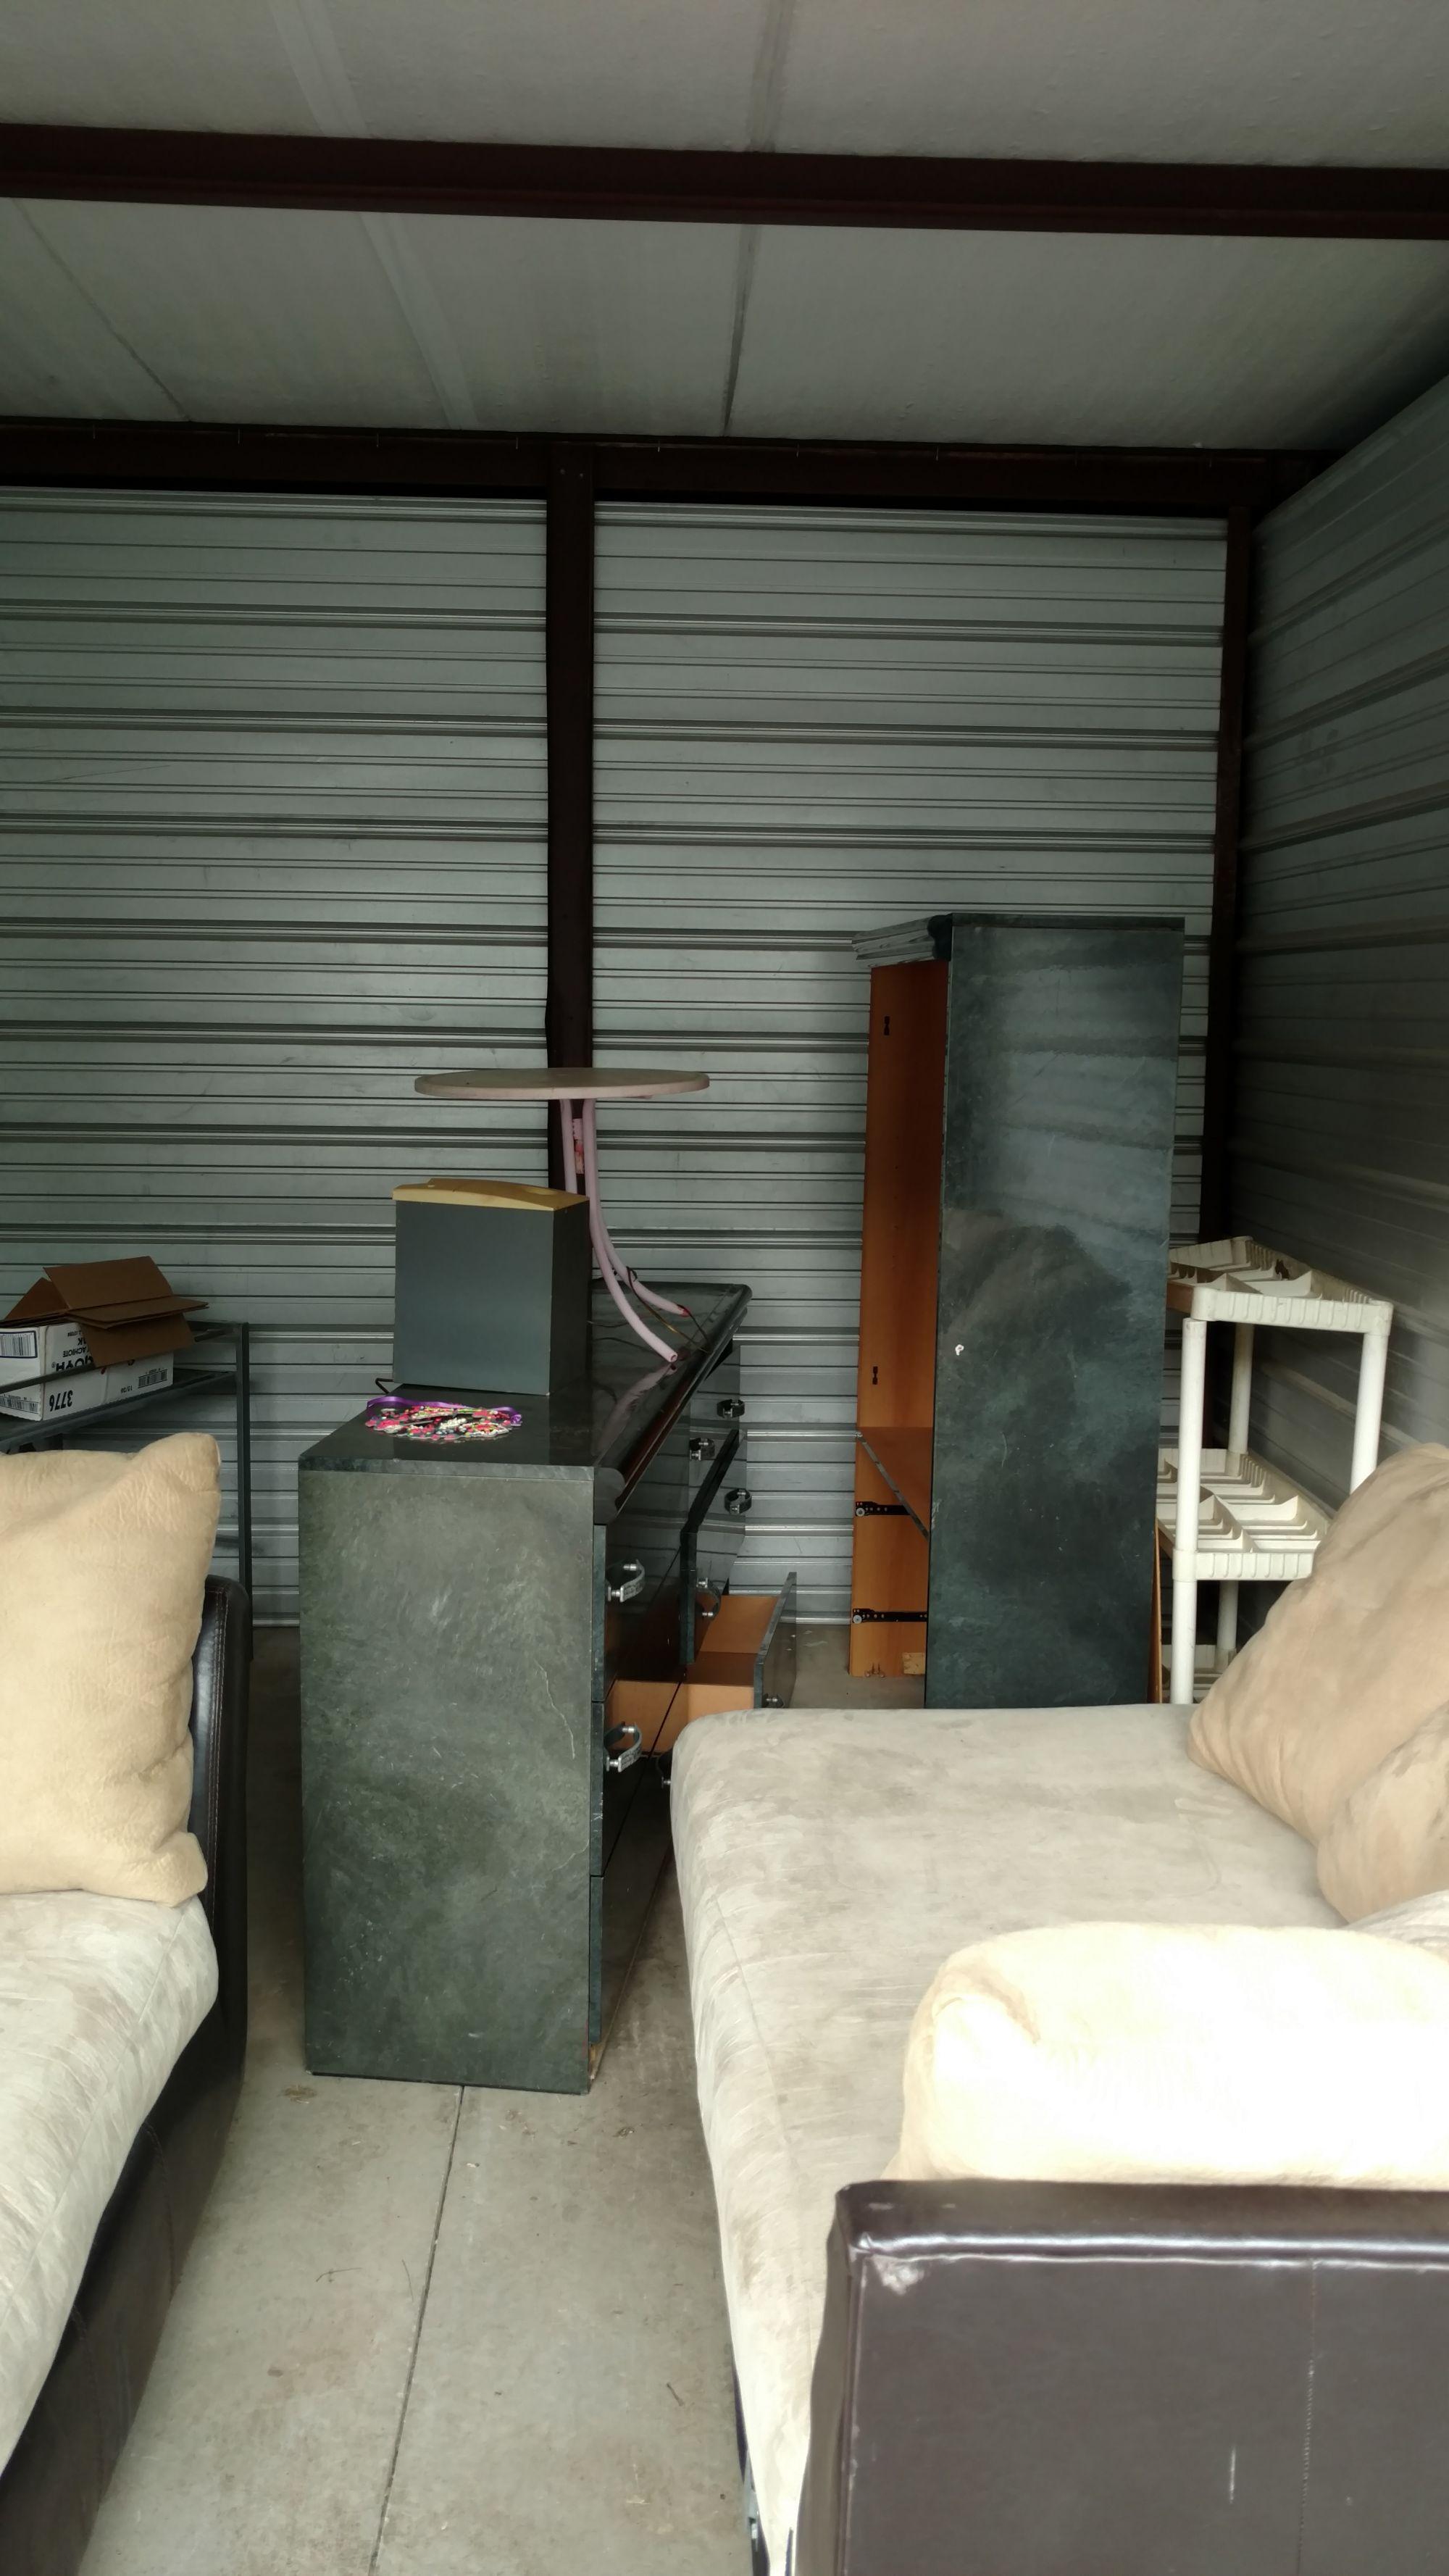 Hover or click & Storage Unit Auction: 552986 | Radcliff KY | StorageTreasures.com